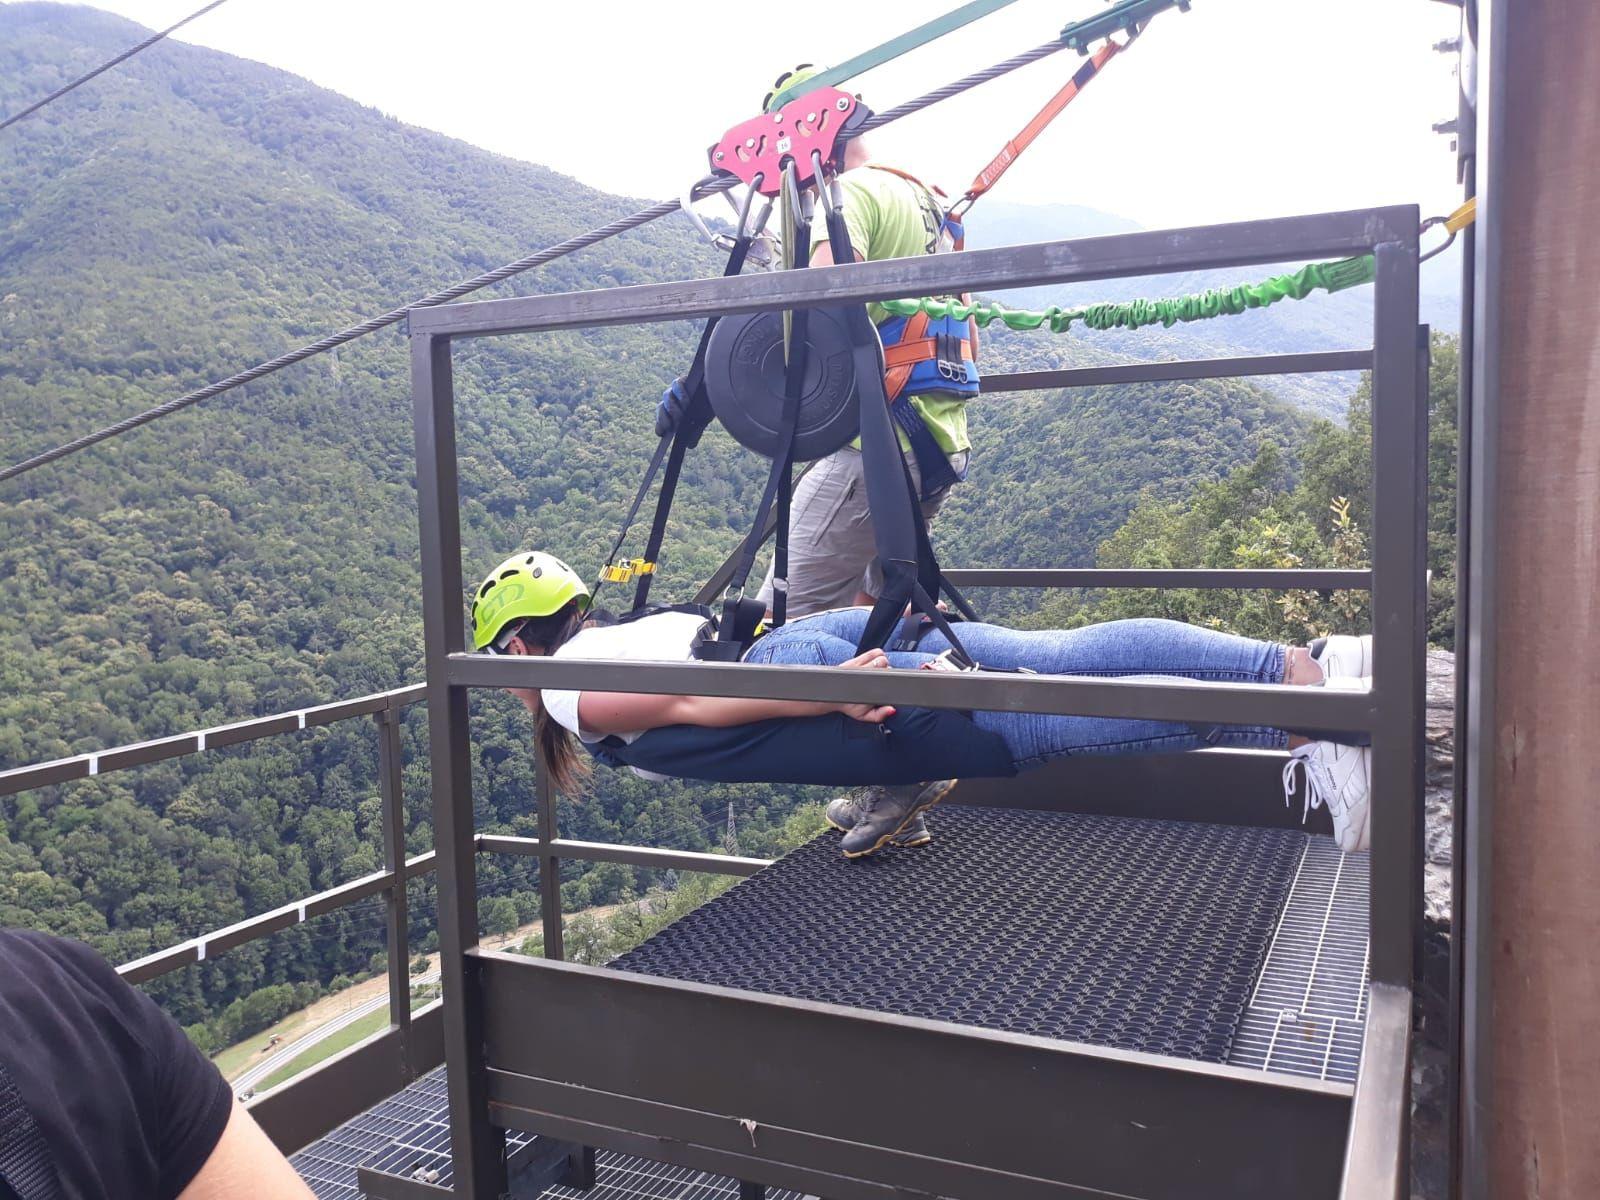 Volo in zipline a Pomaretto in Val Germanasca